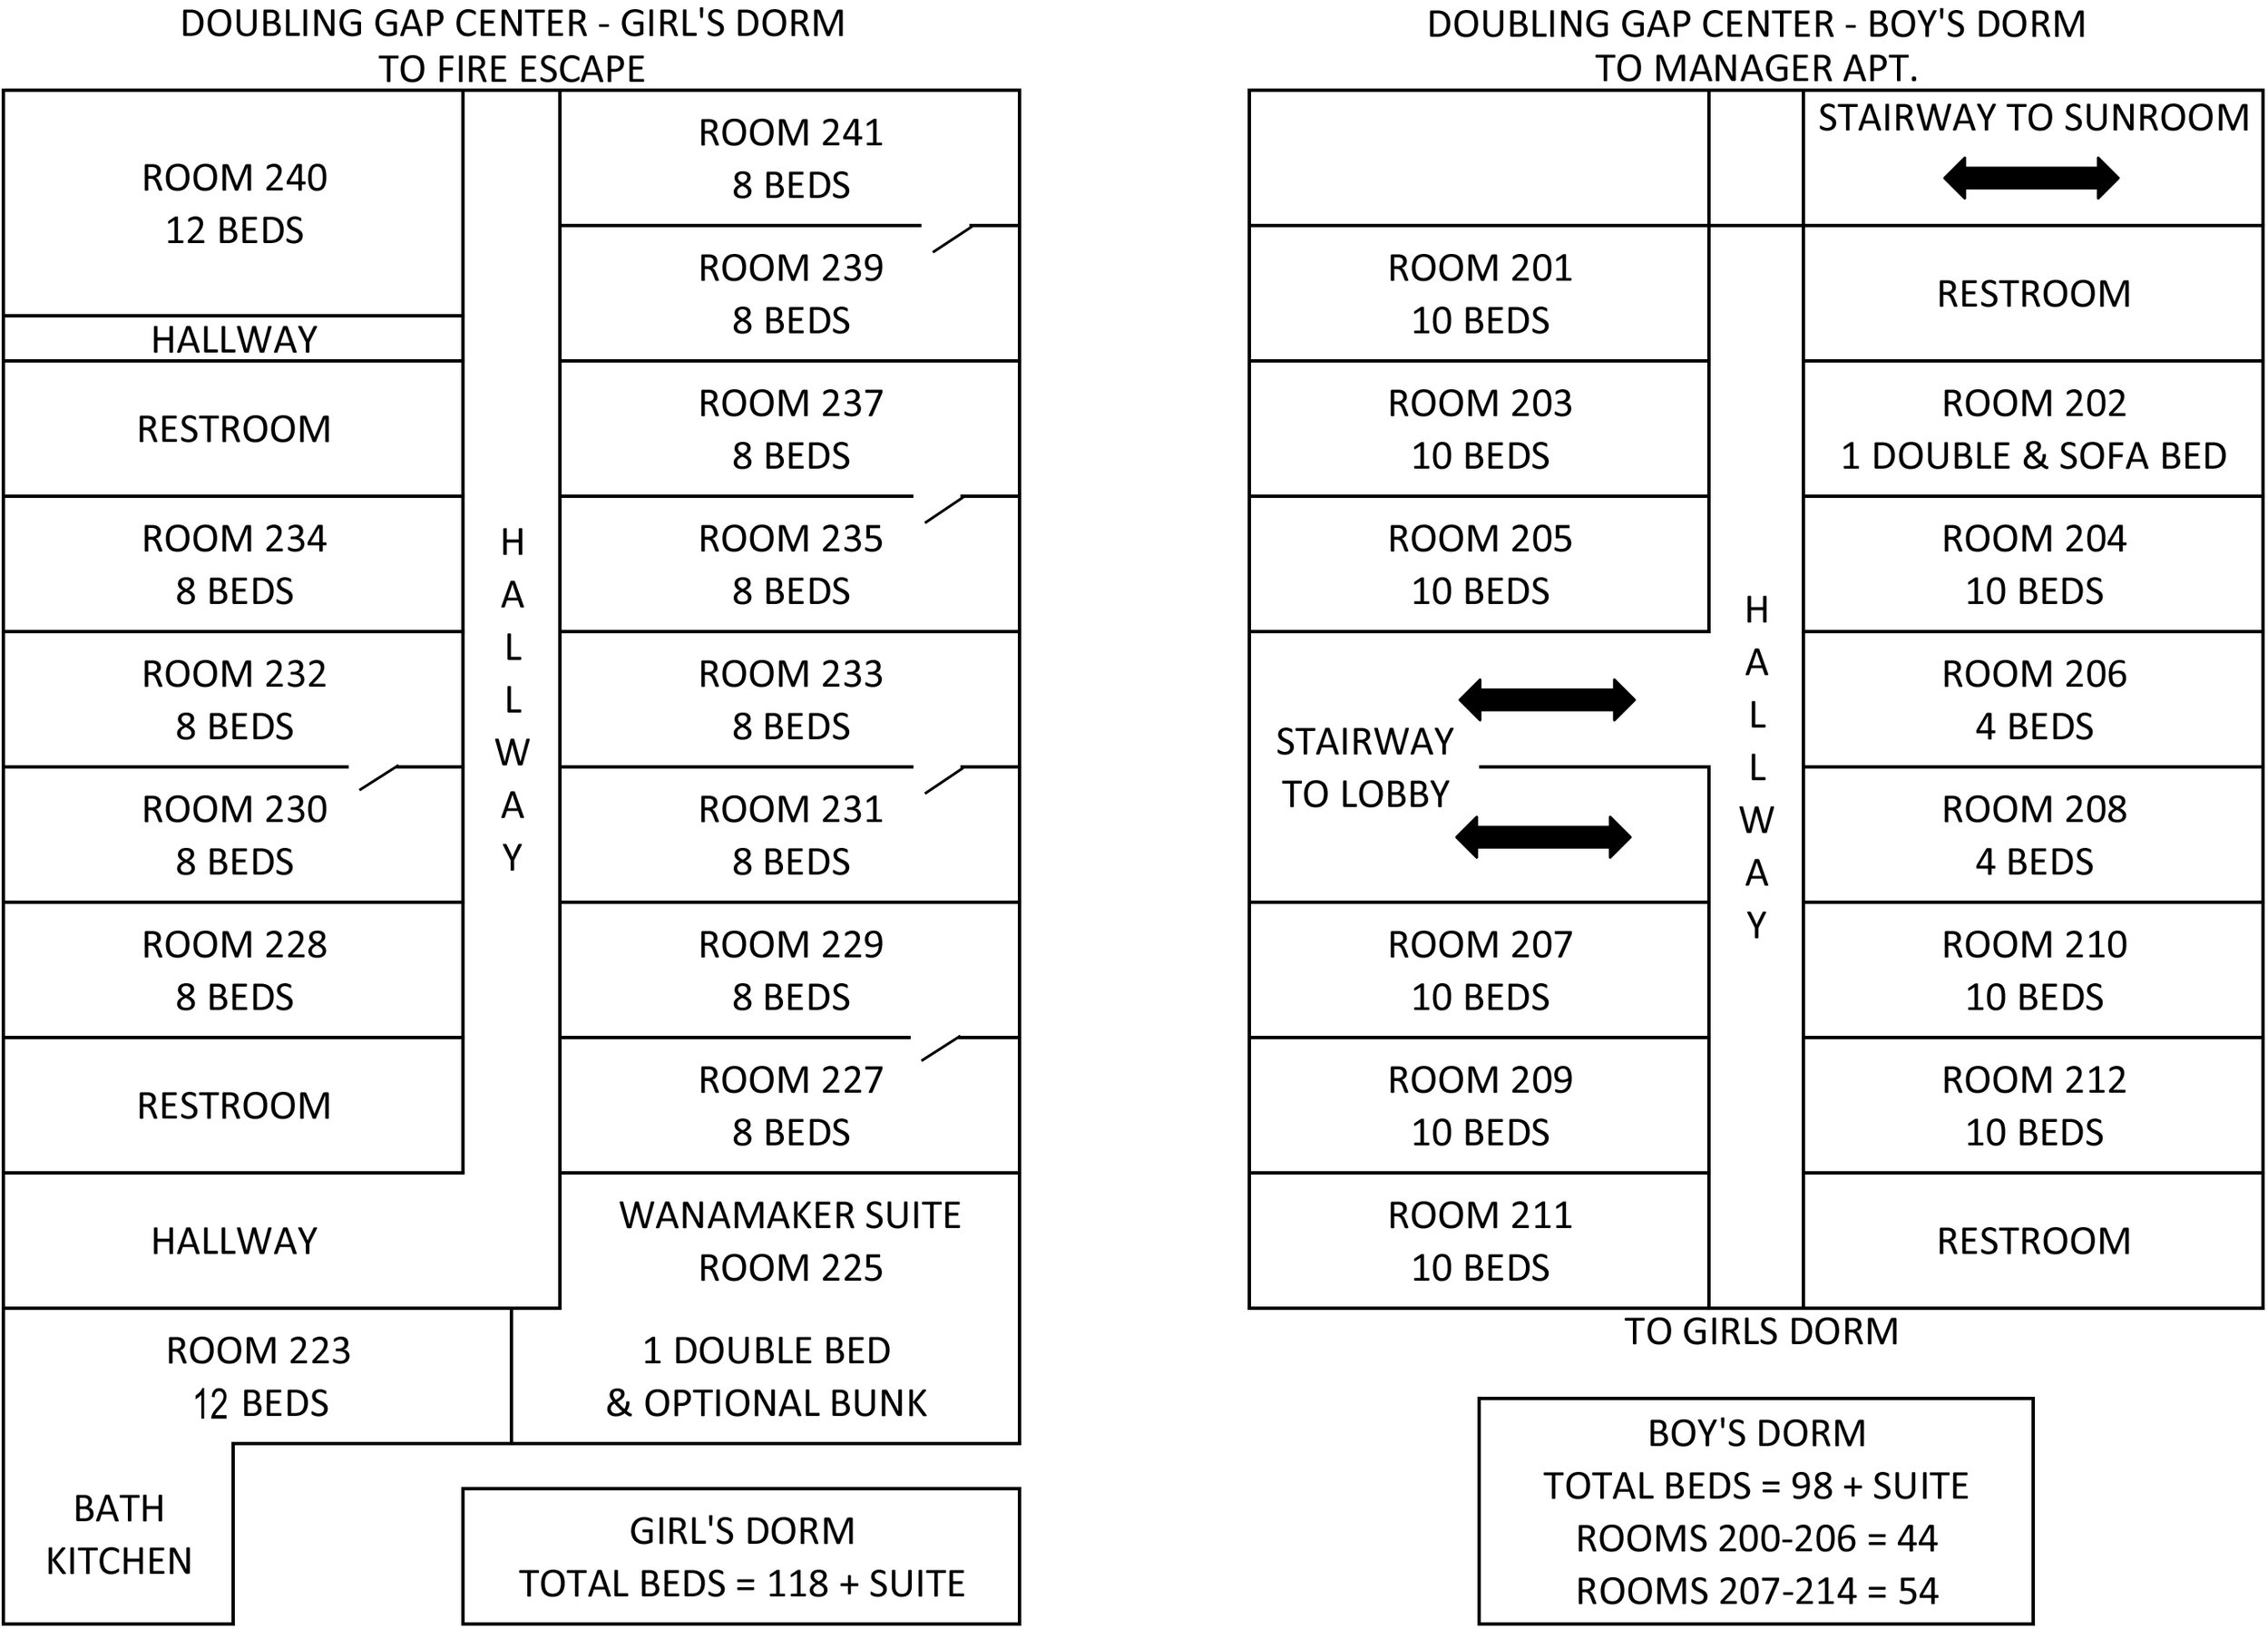 Dormitory Bed Numbers Sheet1.jpg